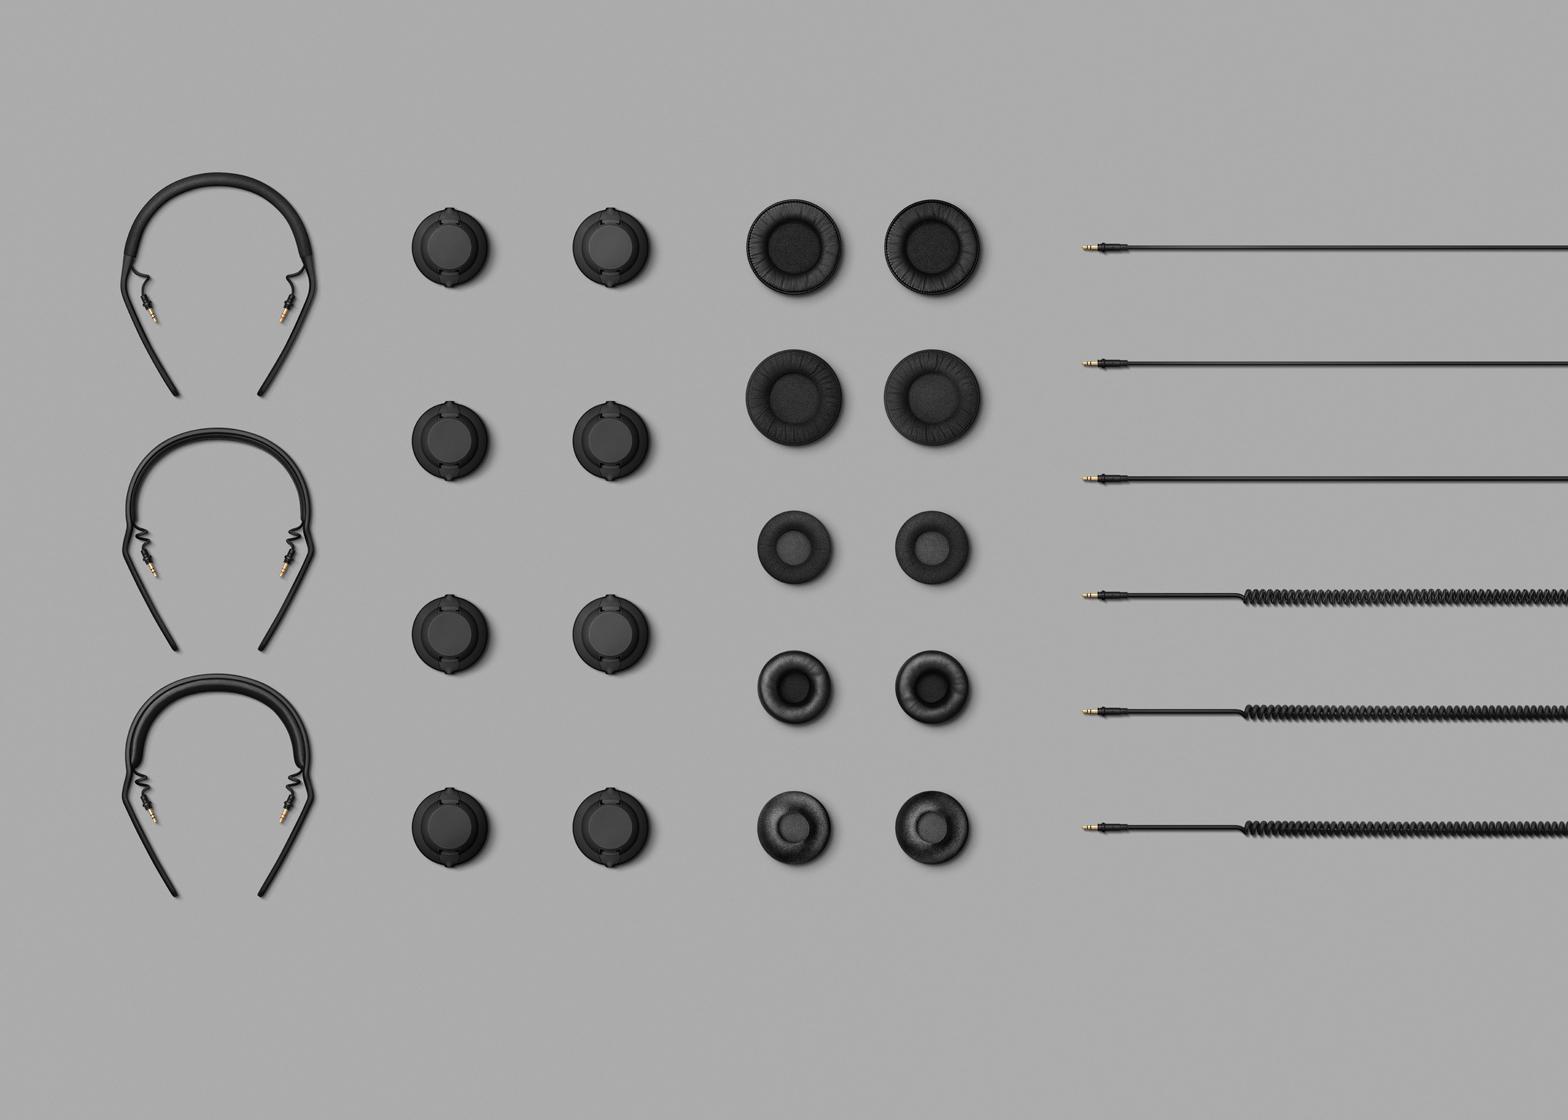 TMA-2 Modular headphones by Kilo